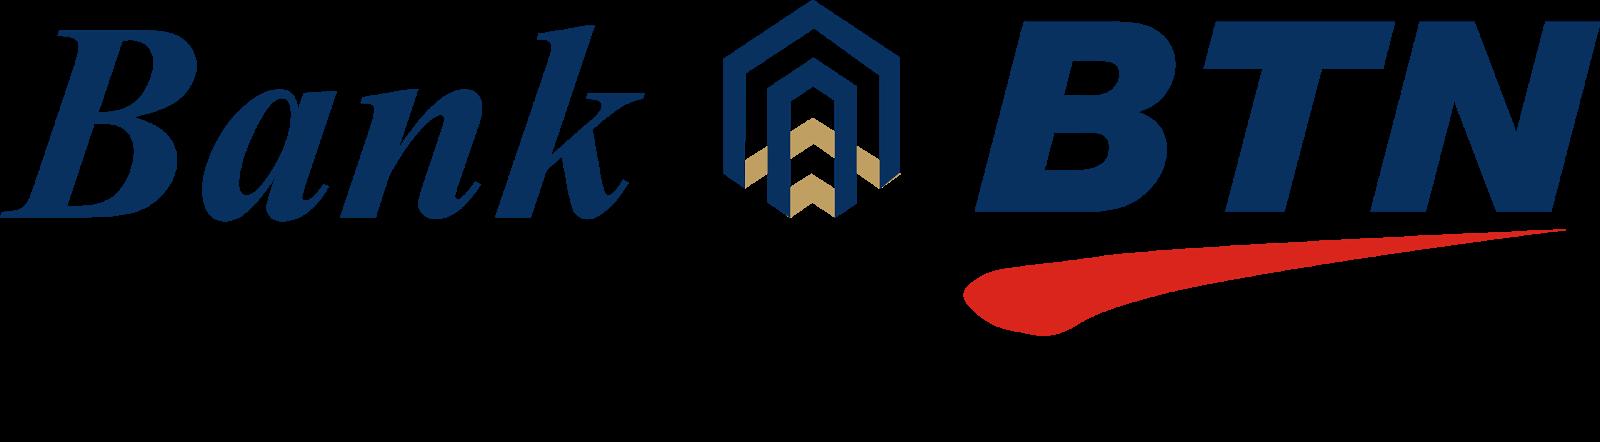 logo btn bank tabungan negara free vector cdr logo